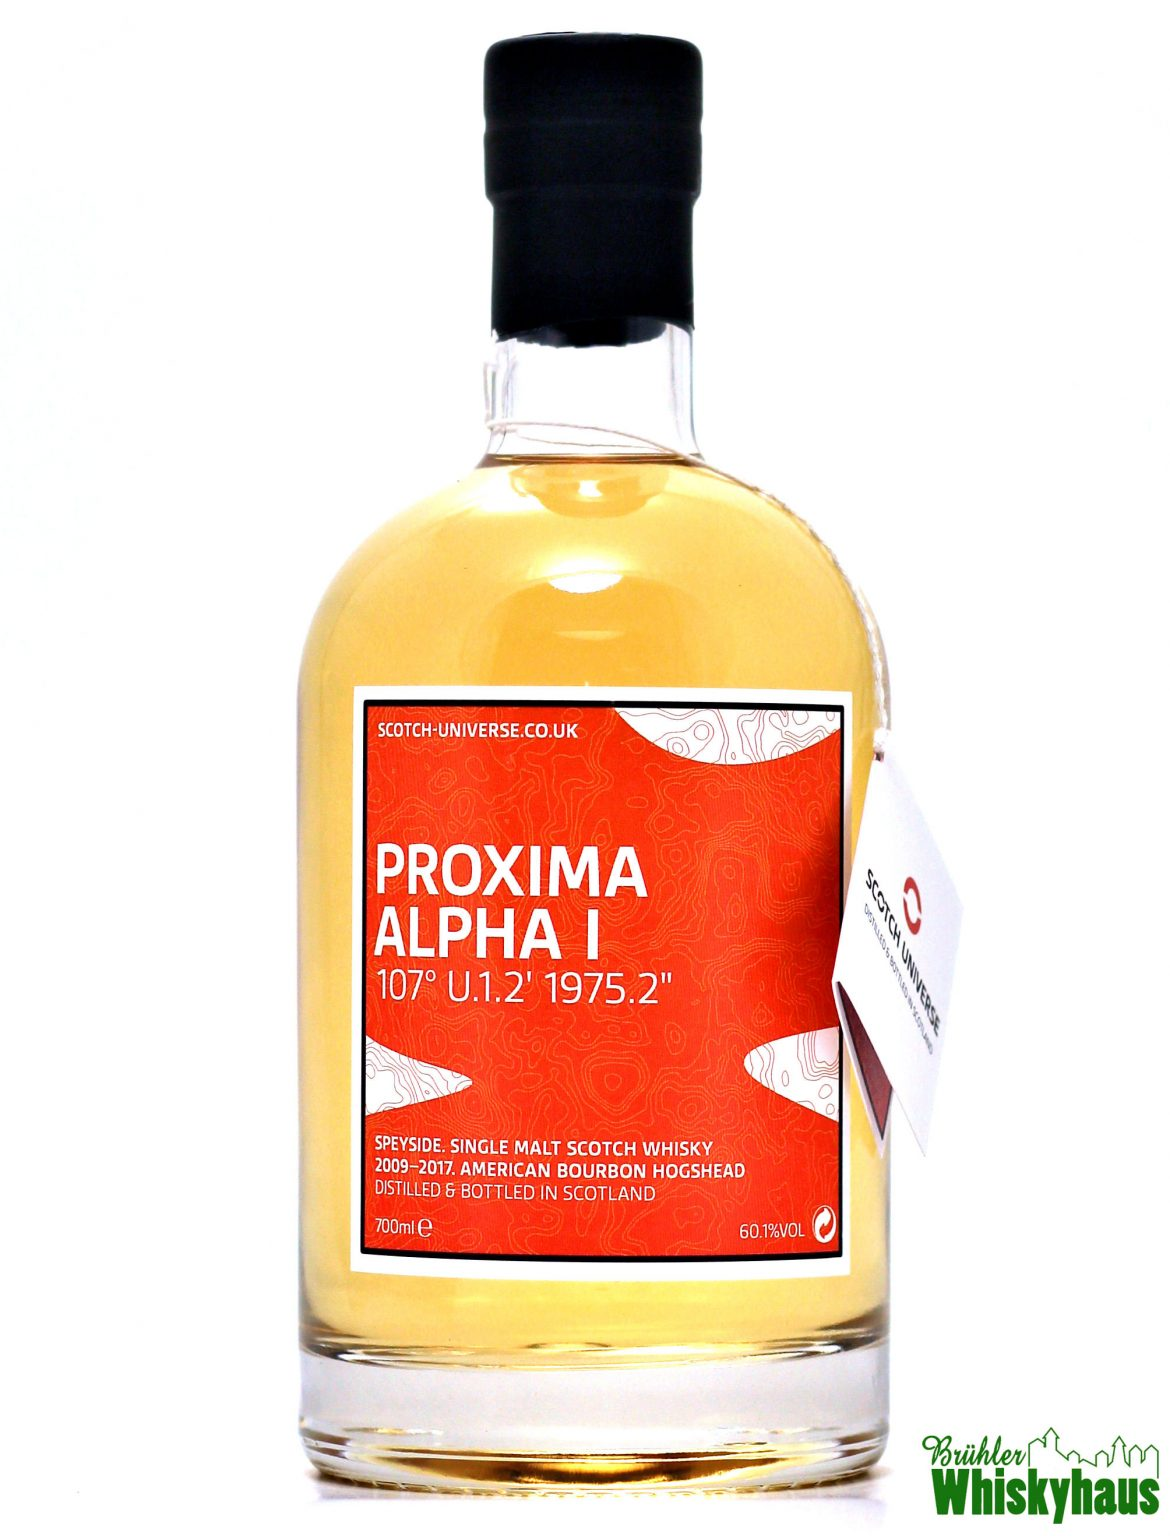 "PROXIMA ALPHA I – 107° U.1.2' 1975.2"" - 8 Jahre – American Bourbon Hogshead – Scotch Universe – Single Malt Scotch Whisky"